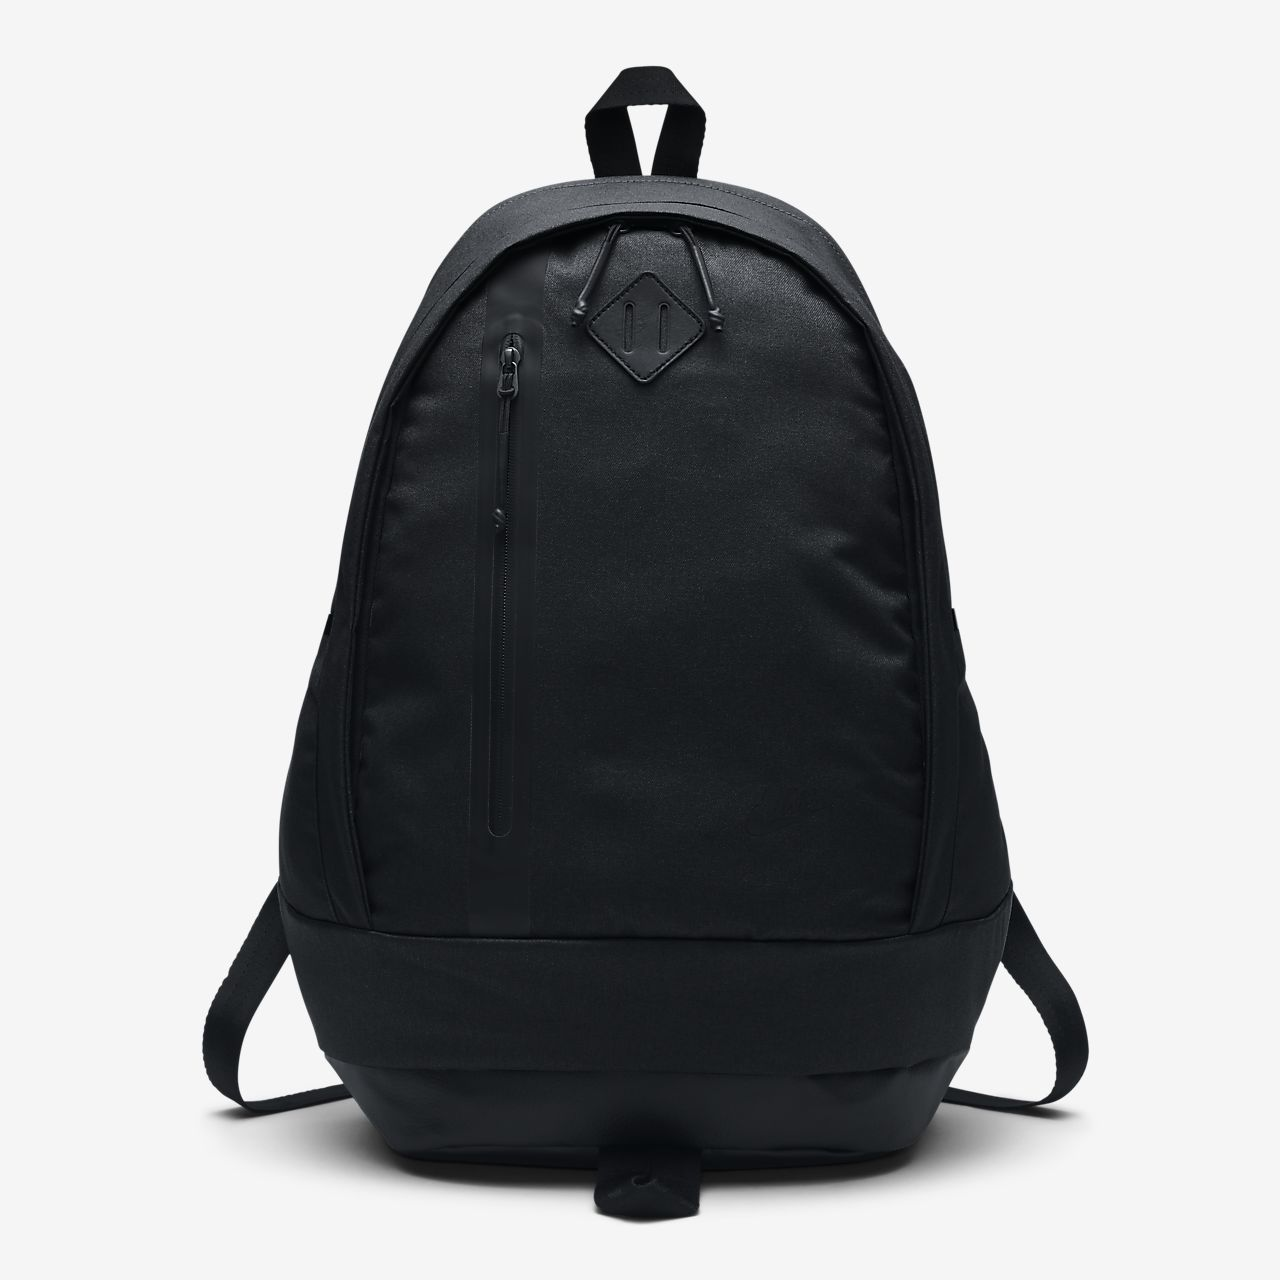 7b7ee80906 Nike Cheyenne Rucksack Backpack - CEAGESP